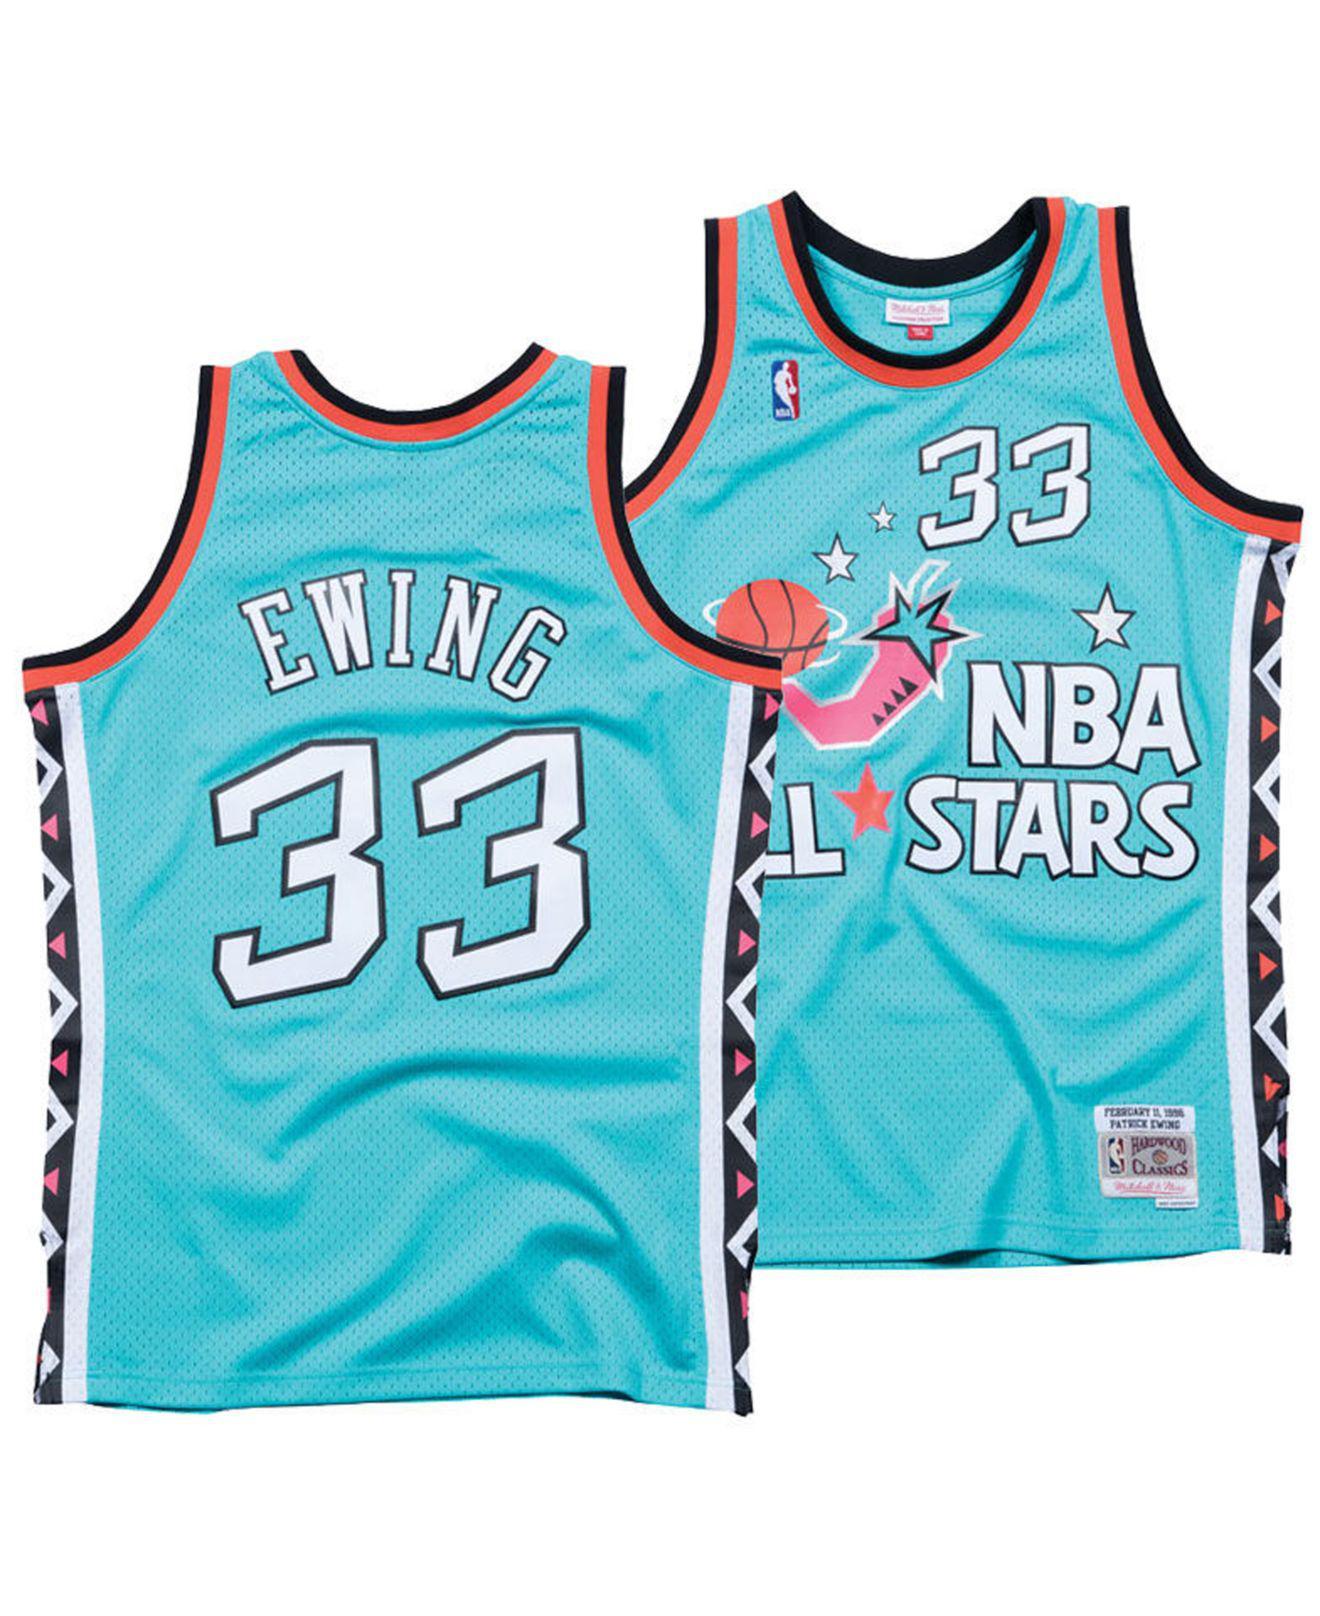 22d36449408 Mitchell   Ness. Men s Blue Patrick Ewing Nba All Star 1996 Swingman Jersey